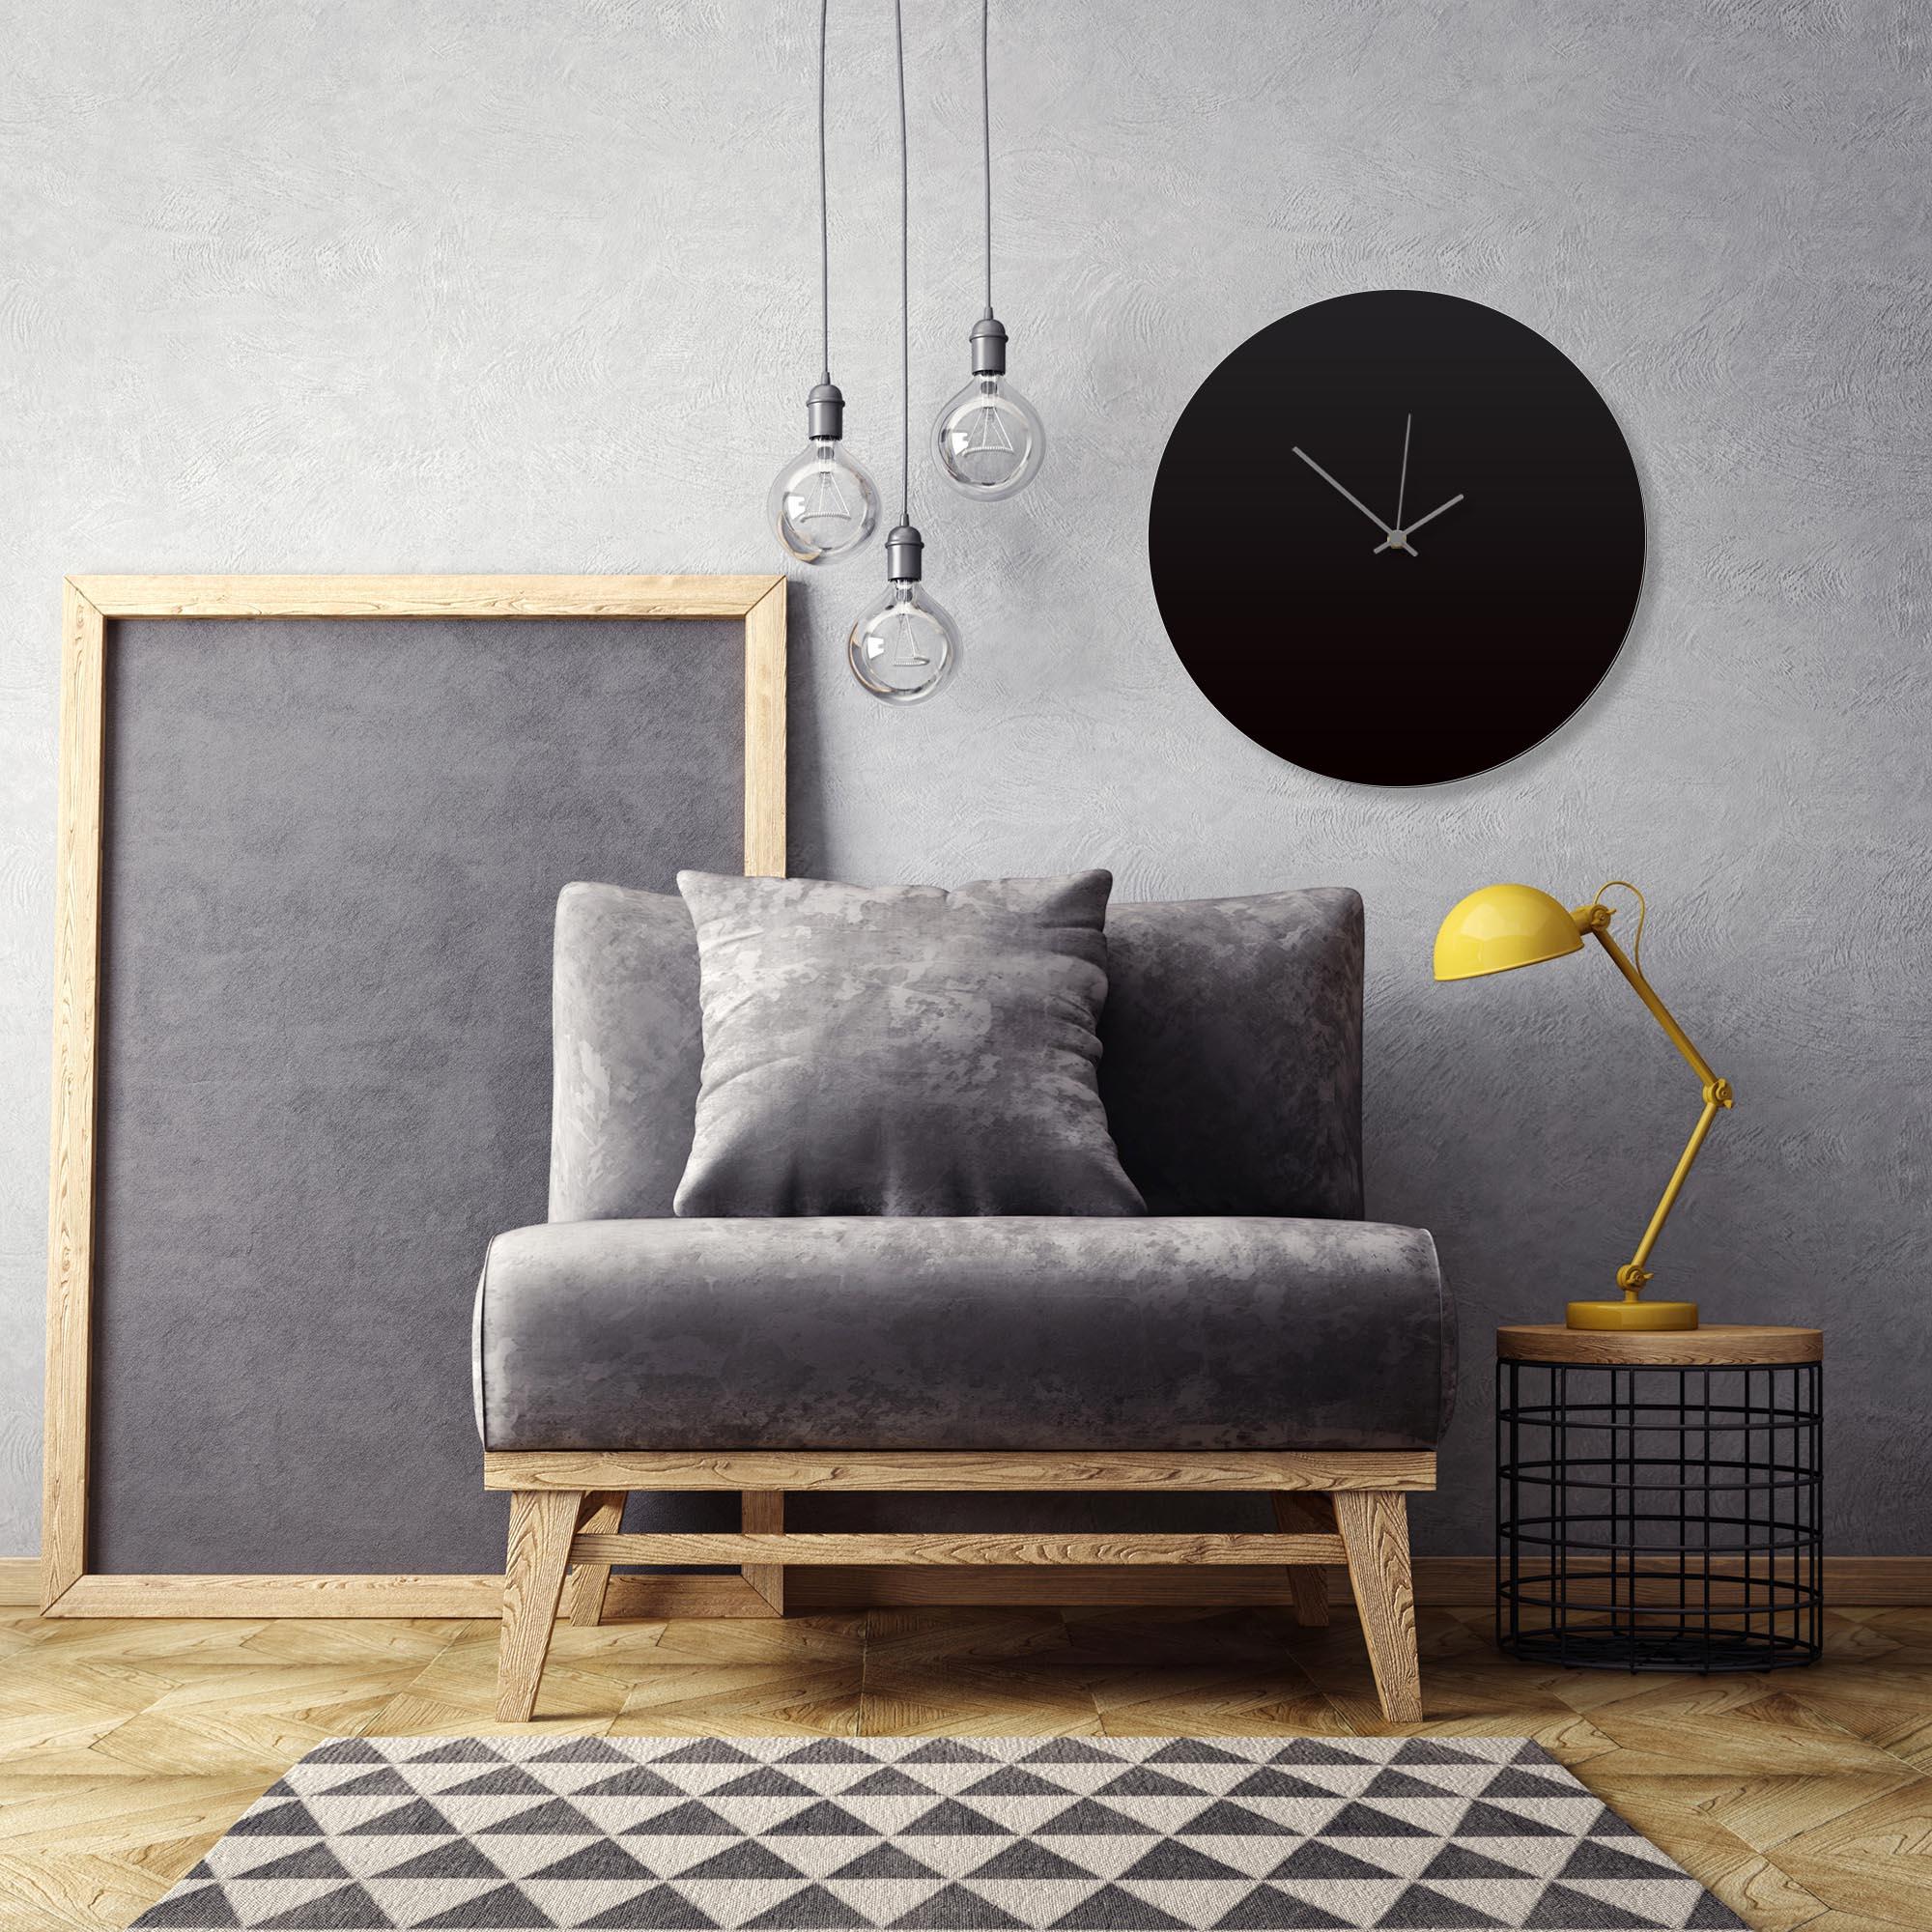 Blackout Grey Circle Clock Large by Adam Schwoeppe Contemporary Clock on Aluminum Polymetal - Alternate View 1